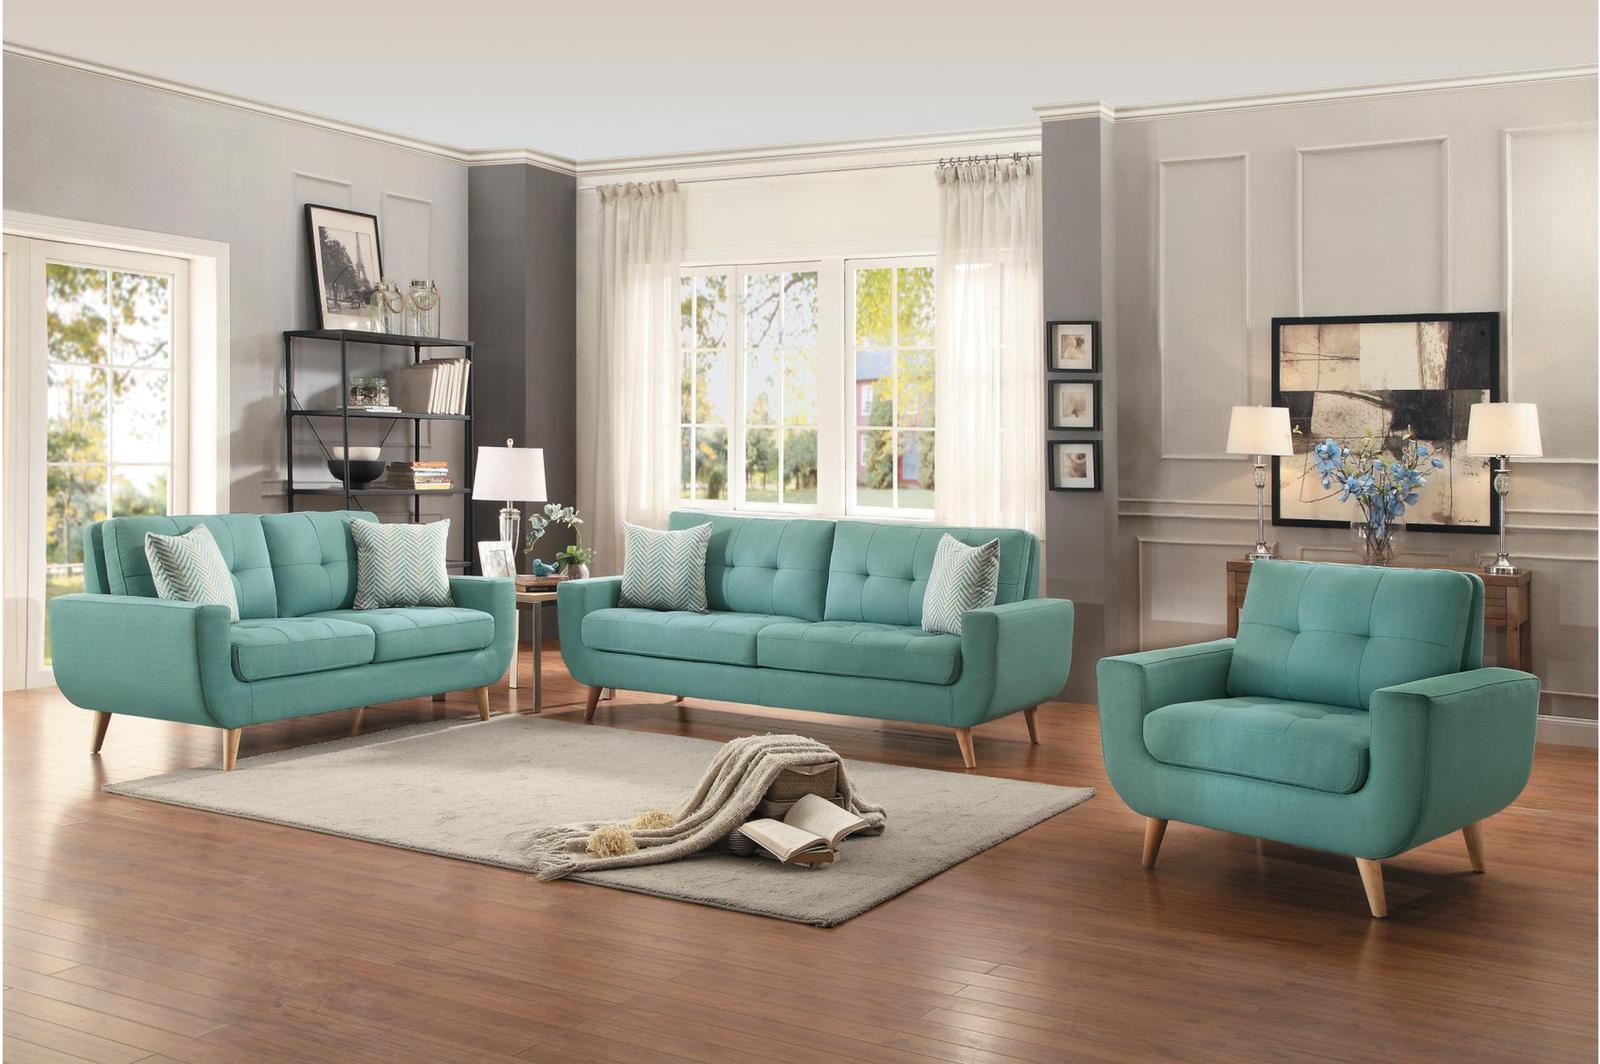 furniture-houston (7)